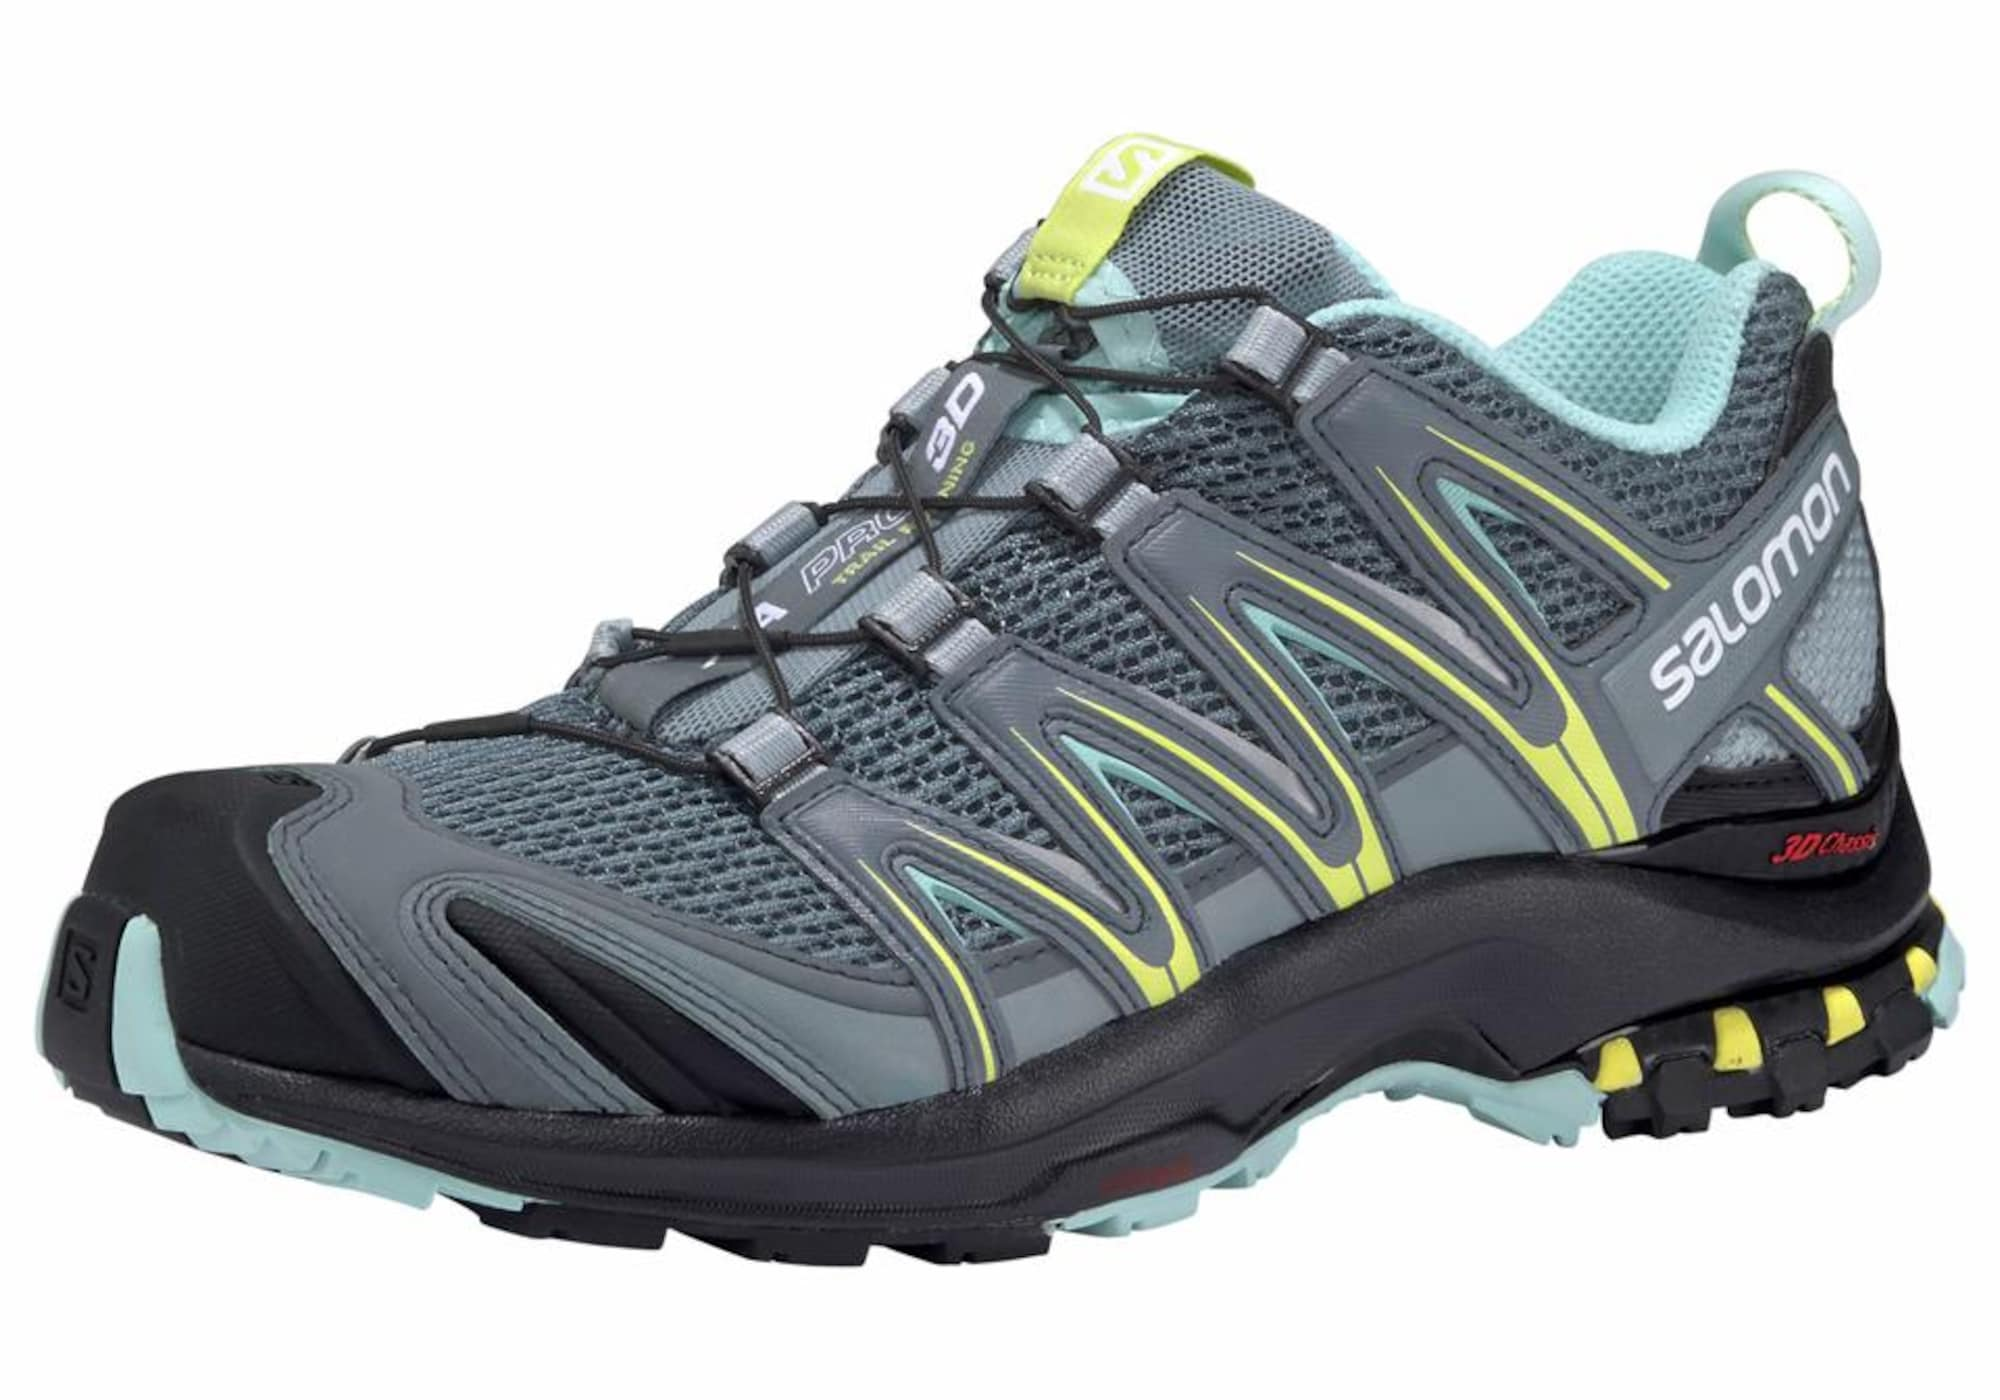 Laufschuh 'XA PRO 3D Trail' | Schuhe > Sportschuhe | Grau - Dunkelgrau - Mint | SALOMON